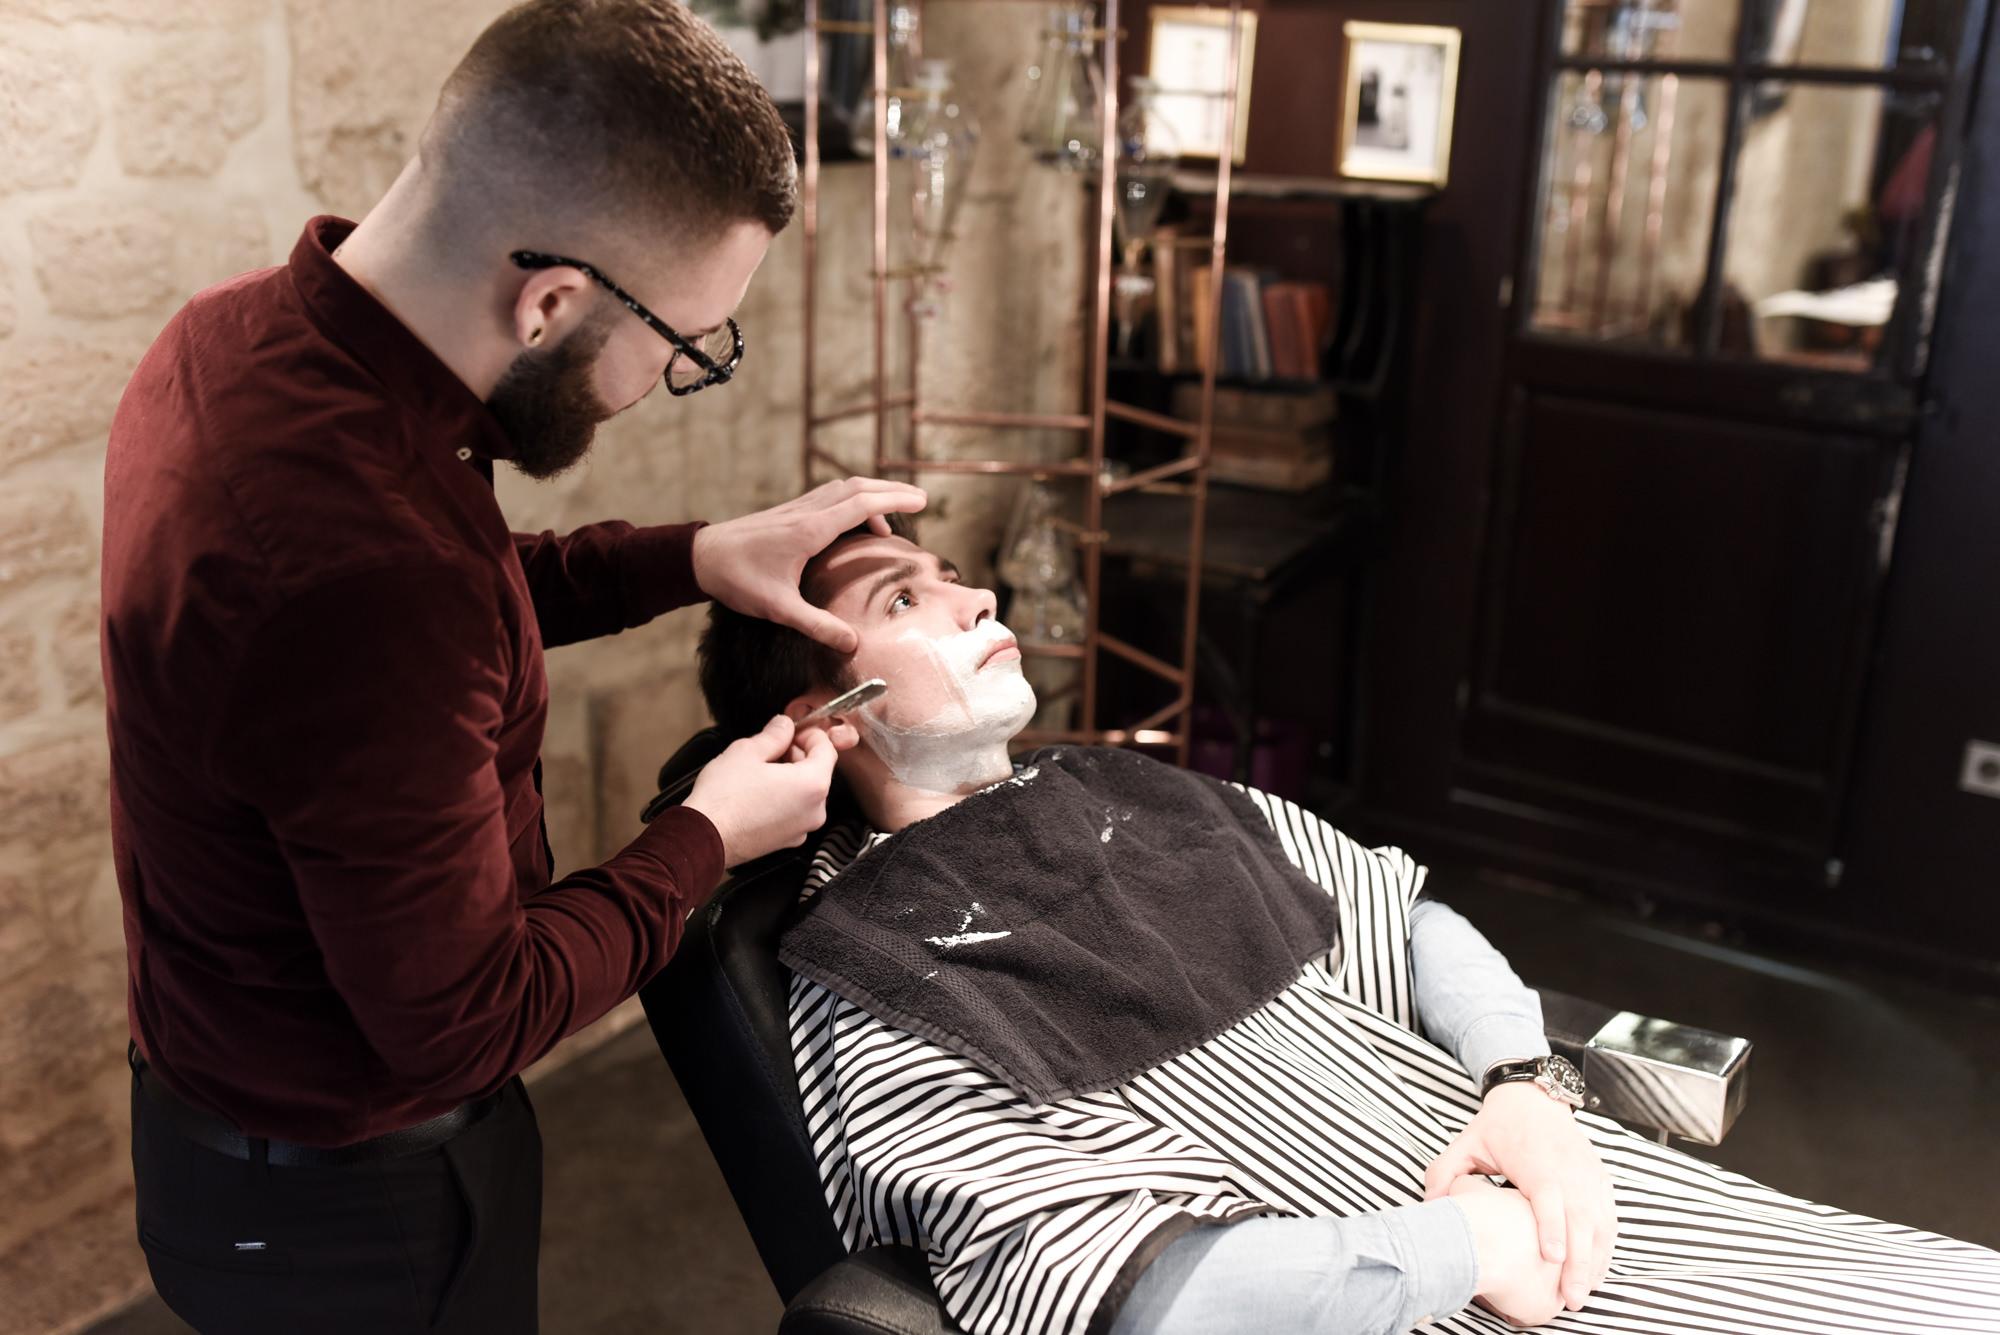 penhaligons barbier (1 sur 1)